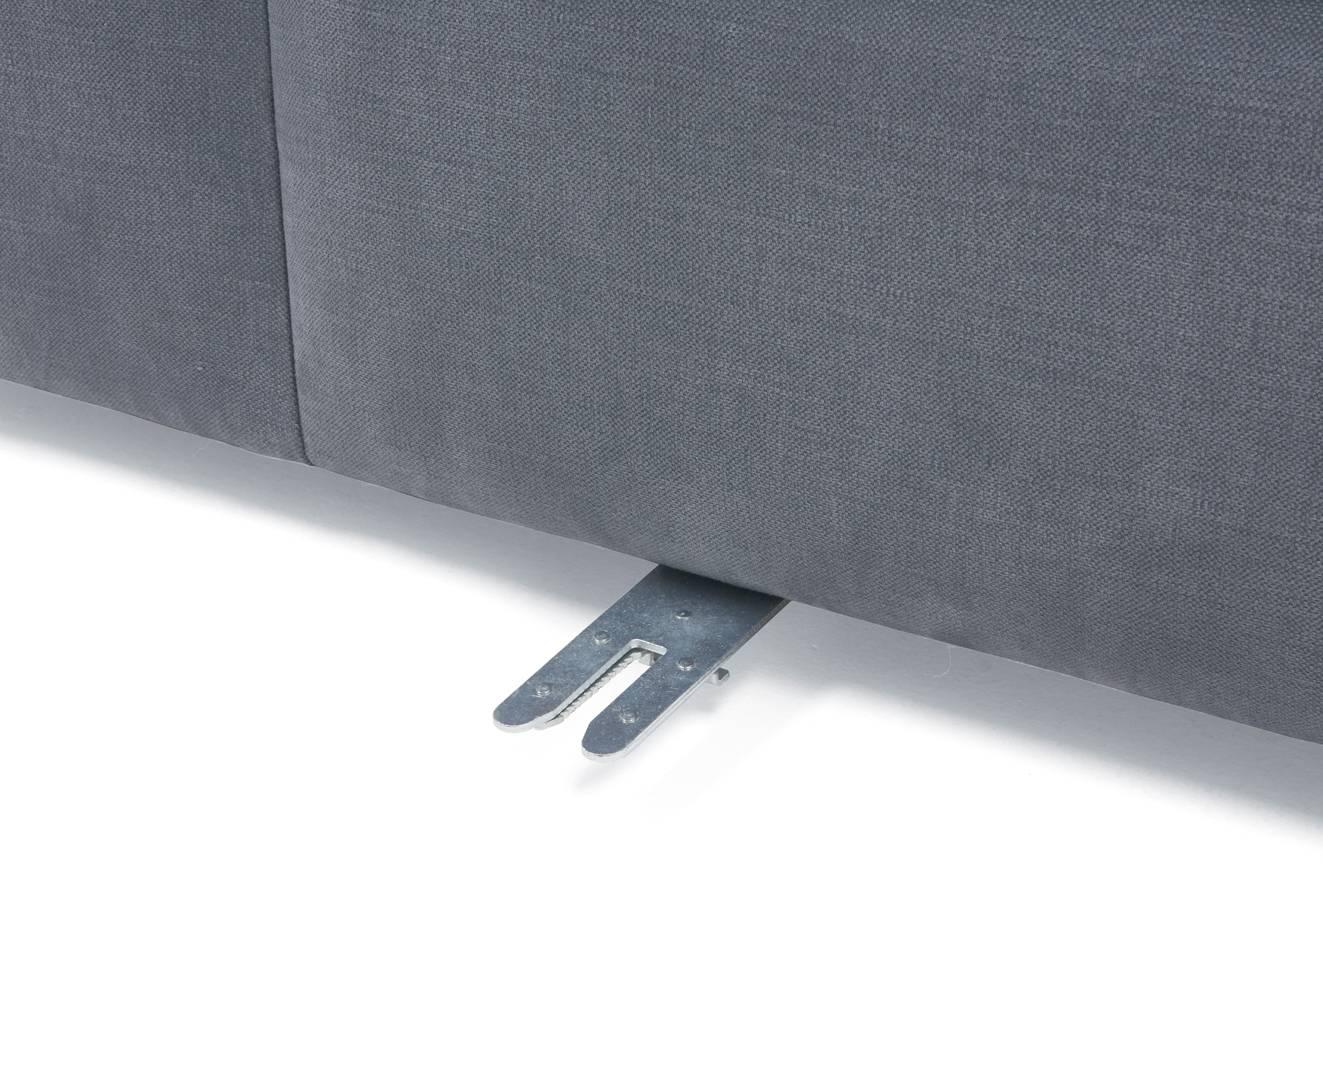 Chatnap Modular Sofa | Sofa Corner Unit | Loaf | Loaf regarding Sofa Corner Units (Image 4 of 30)